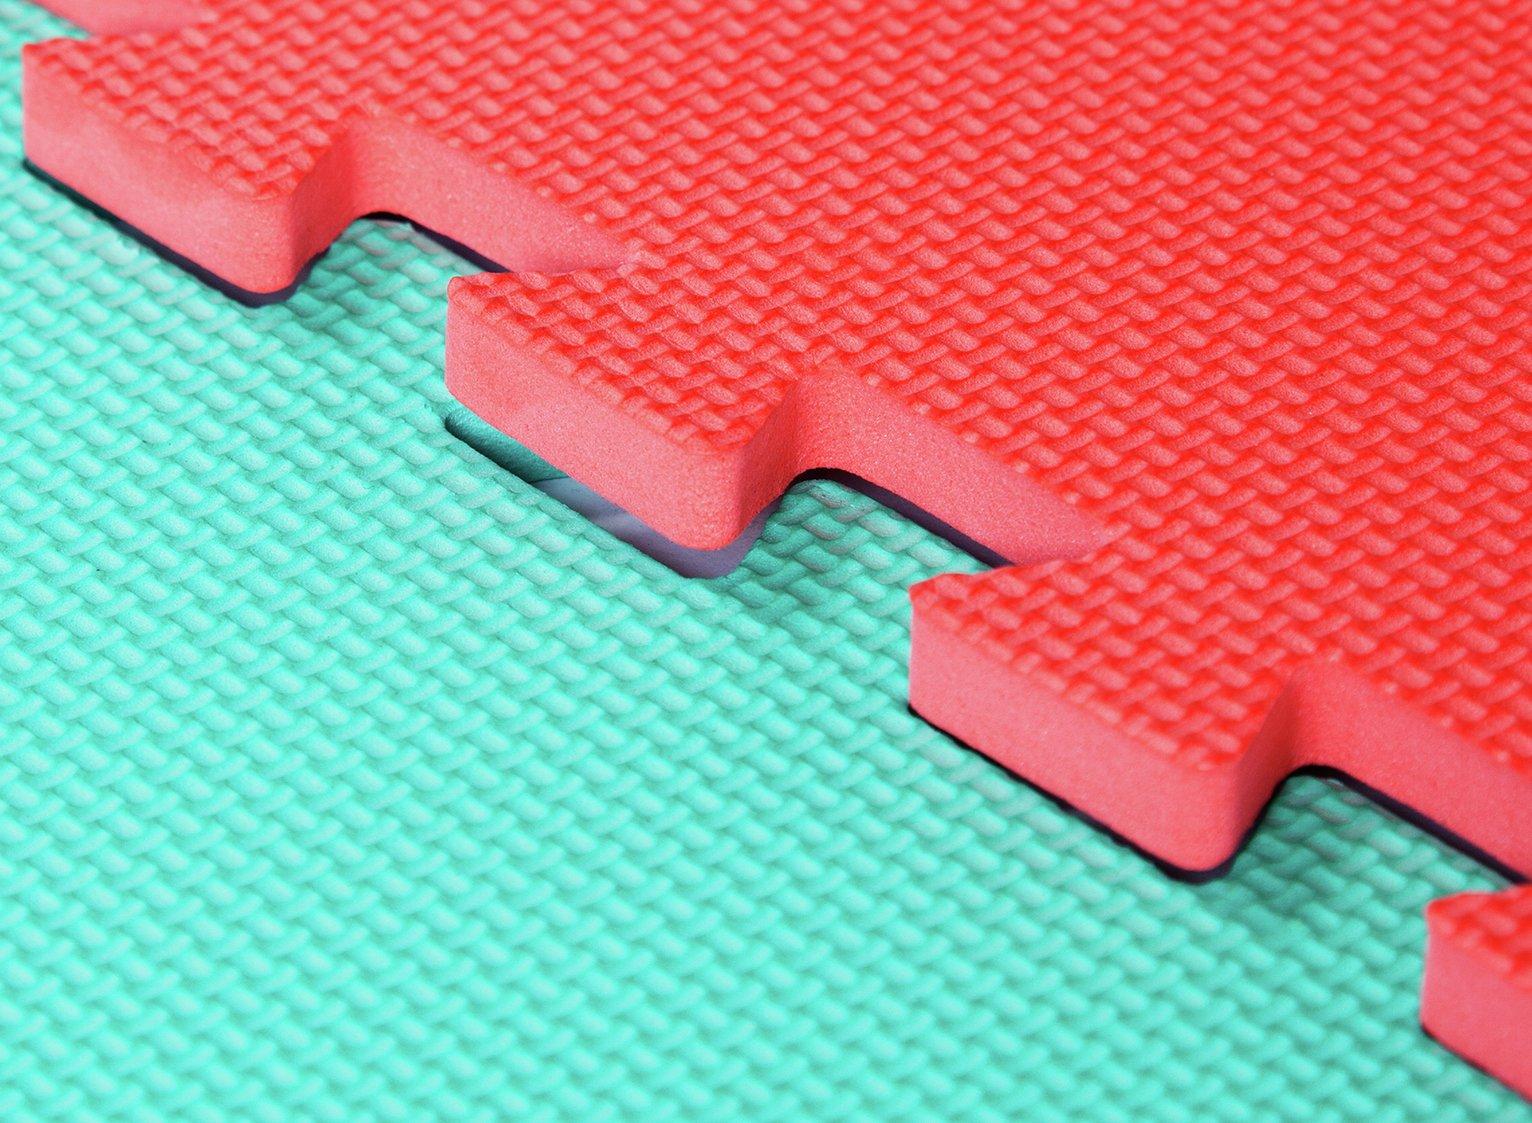 chad valley foam protector tumbler mats